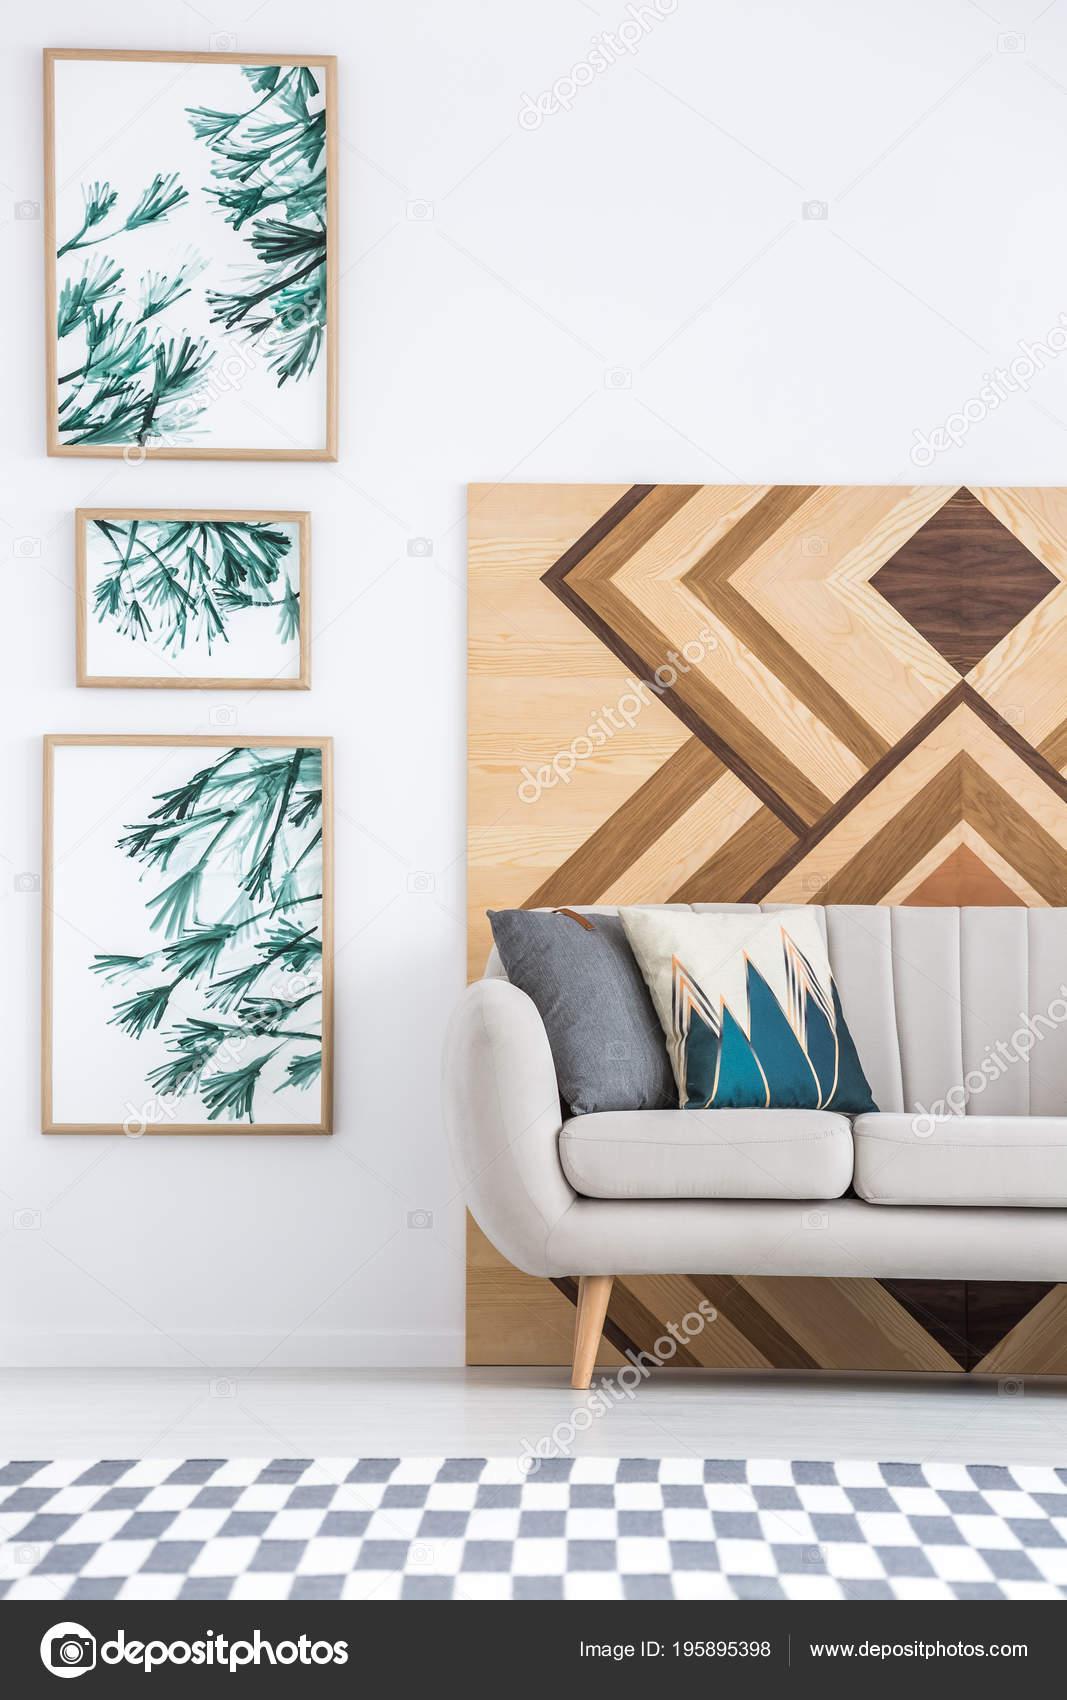 Beige Sofa Geometric Board Living Room Interior Patterned Carpet Gallery Stock Photo C Photographee Eu 195895398